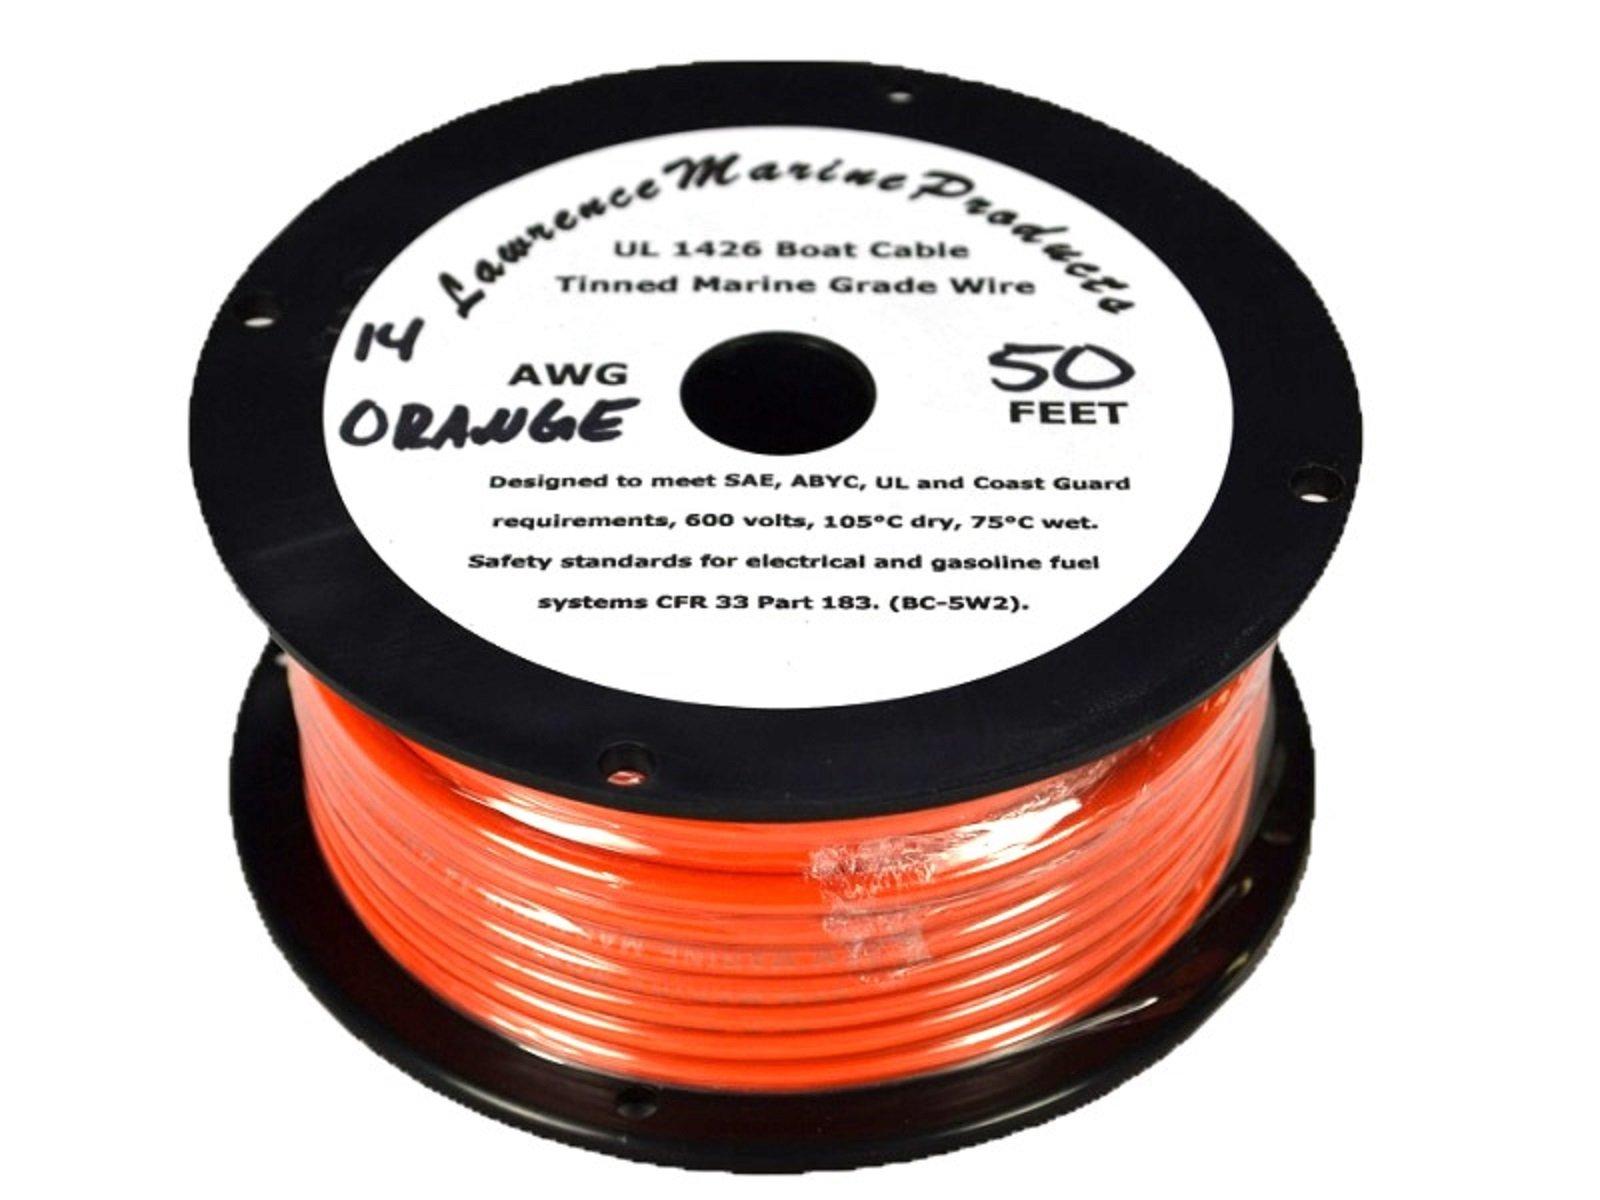 14 AWG Tinned Marine Primary Wire, Orange, 50 Feet